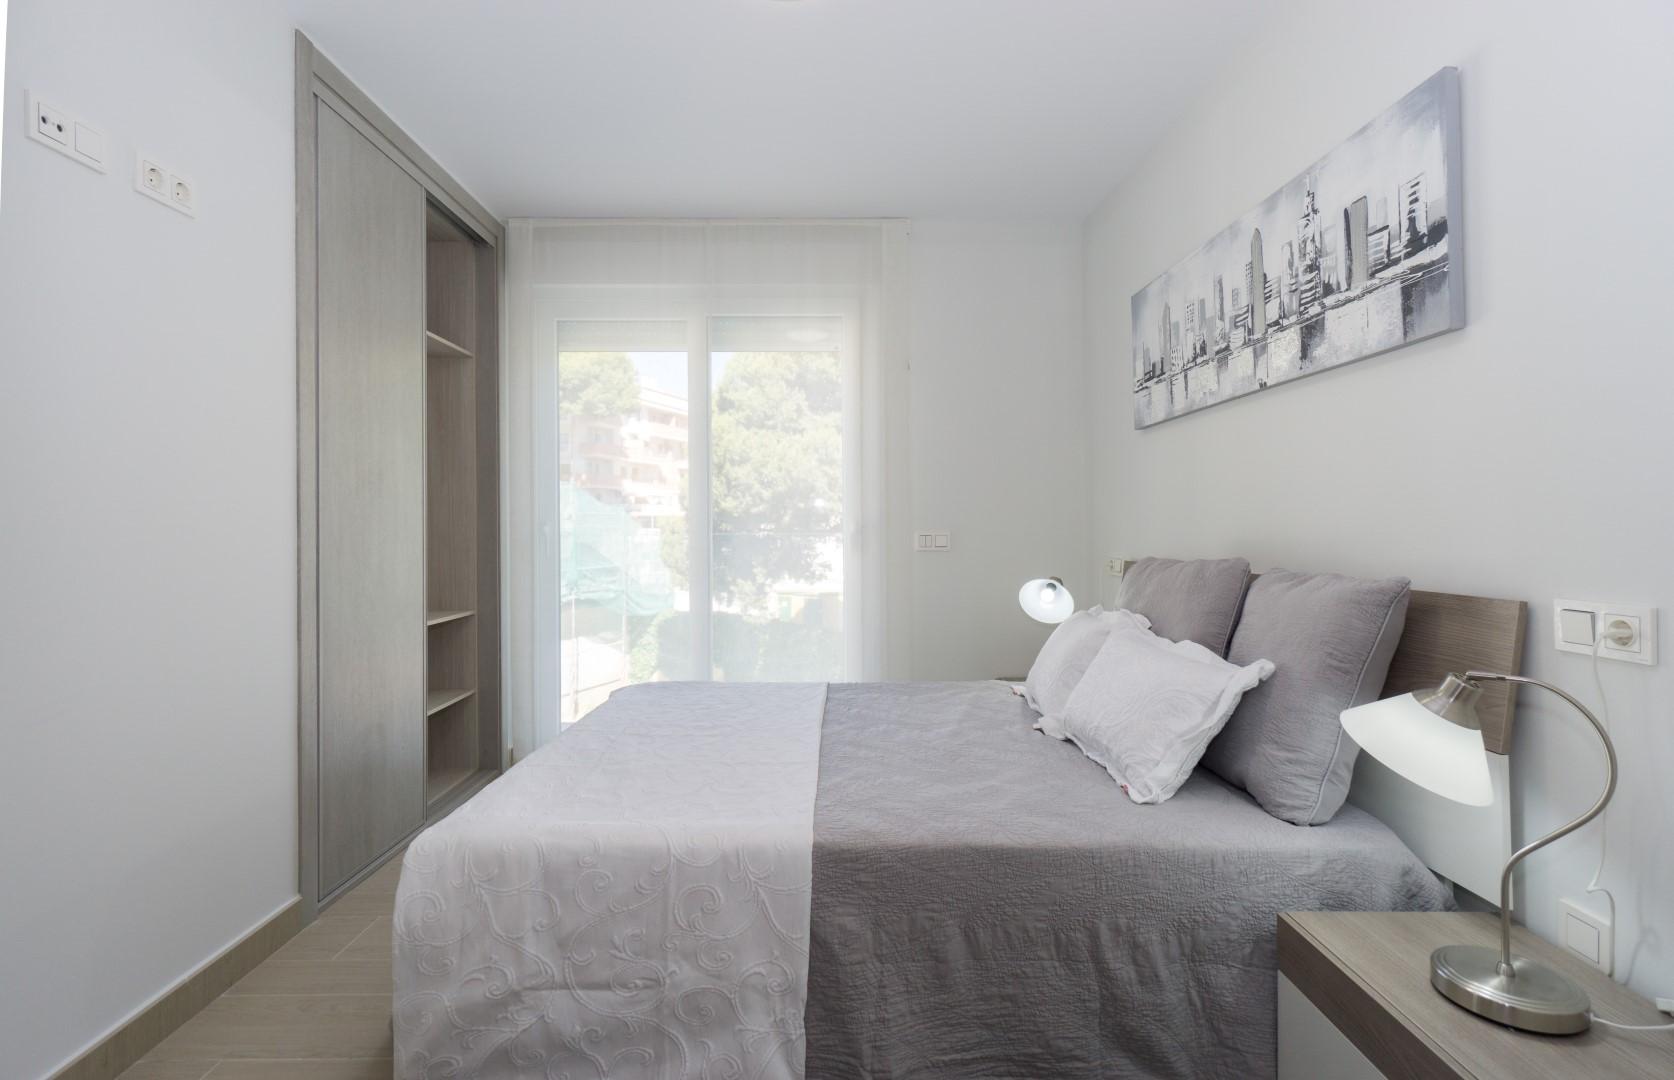 Apartment in Benalmadena MA3142741 11